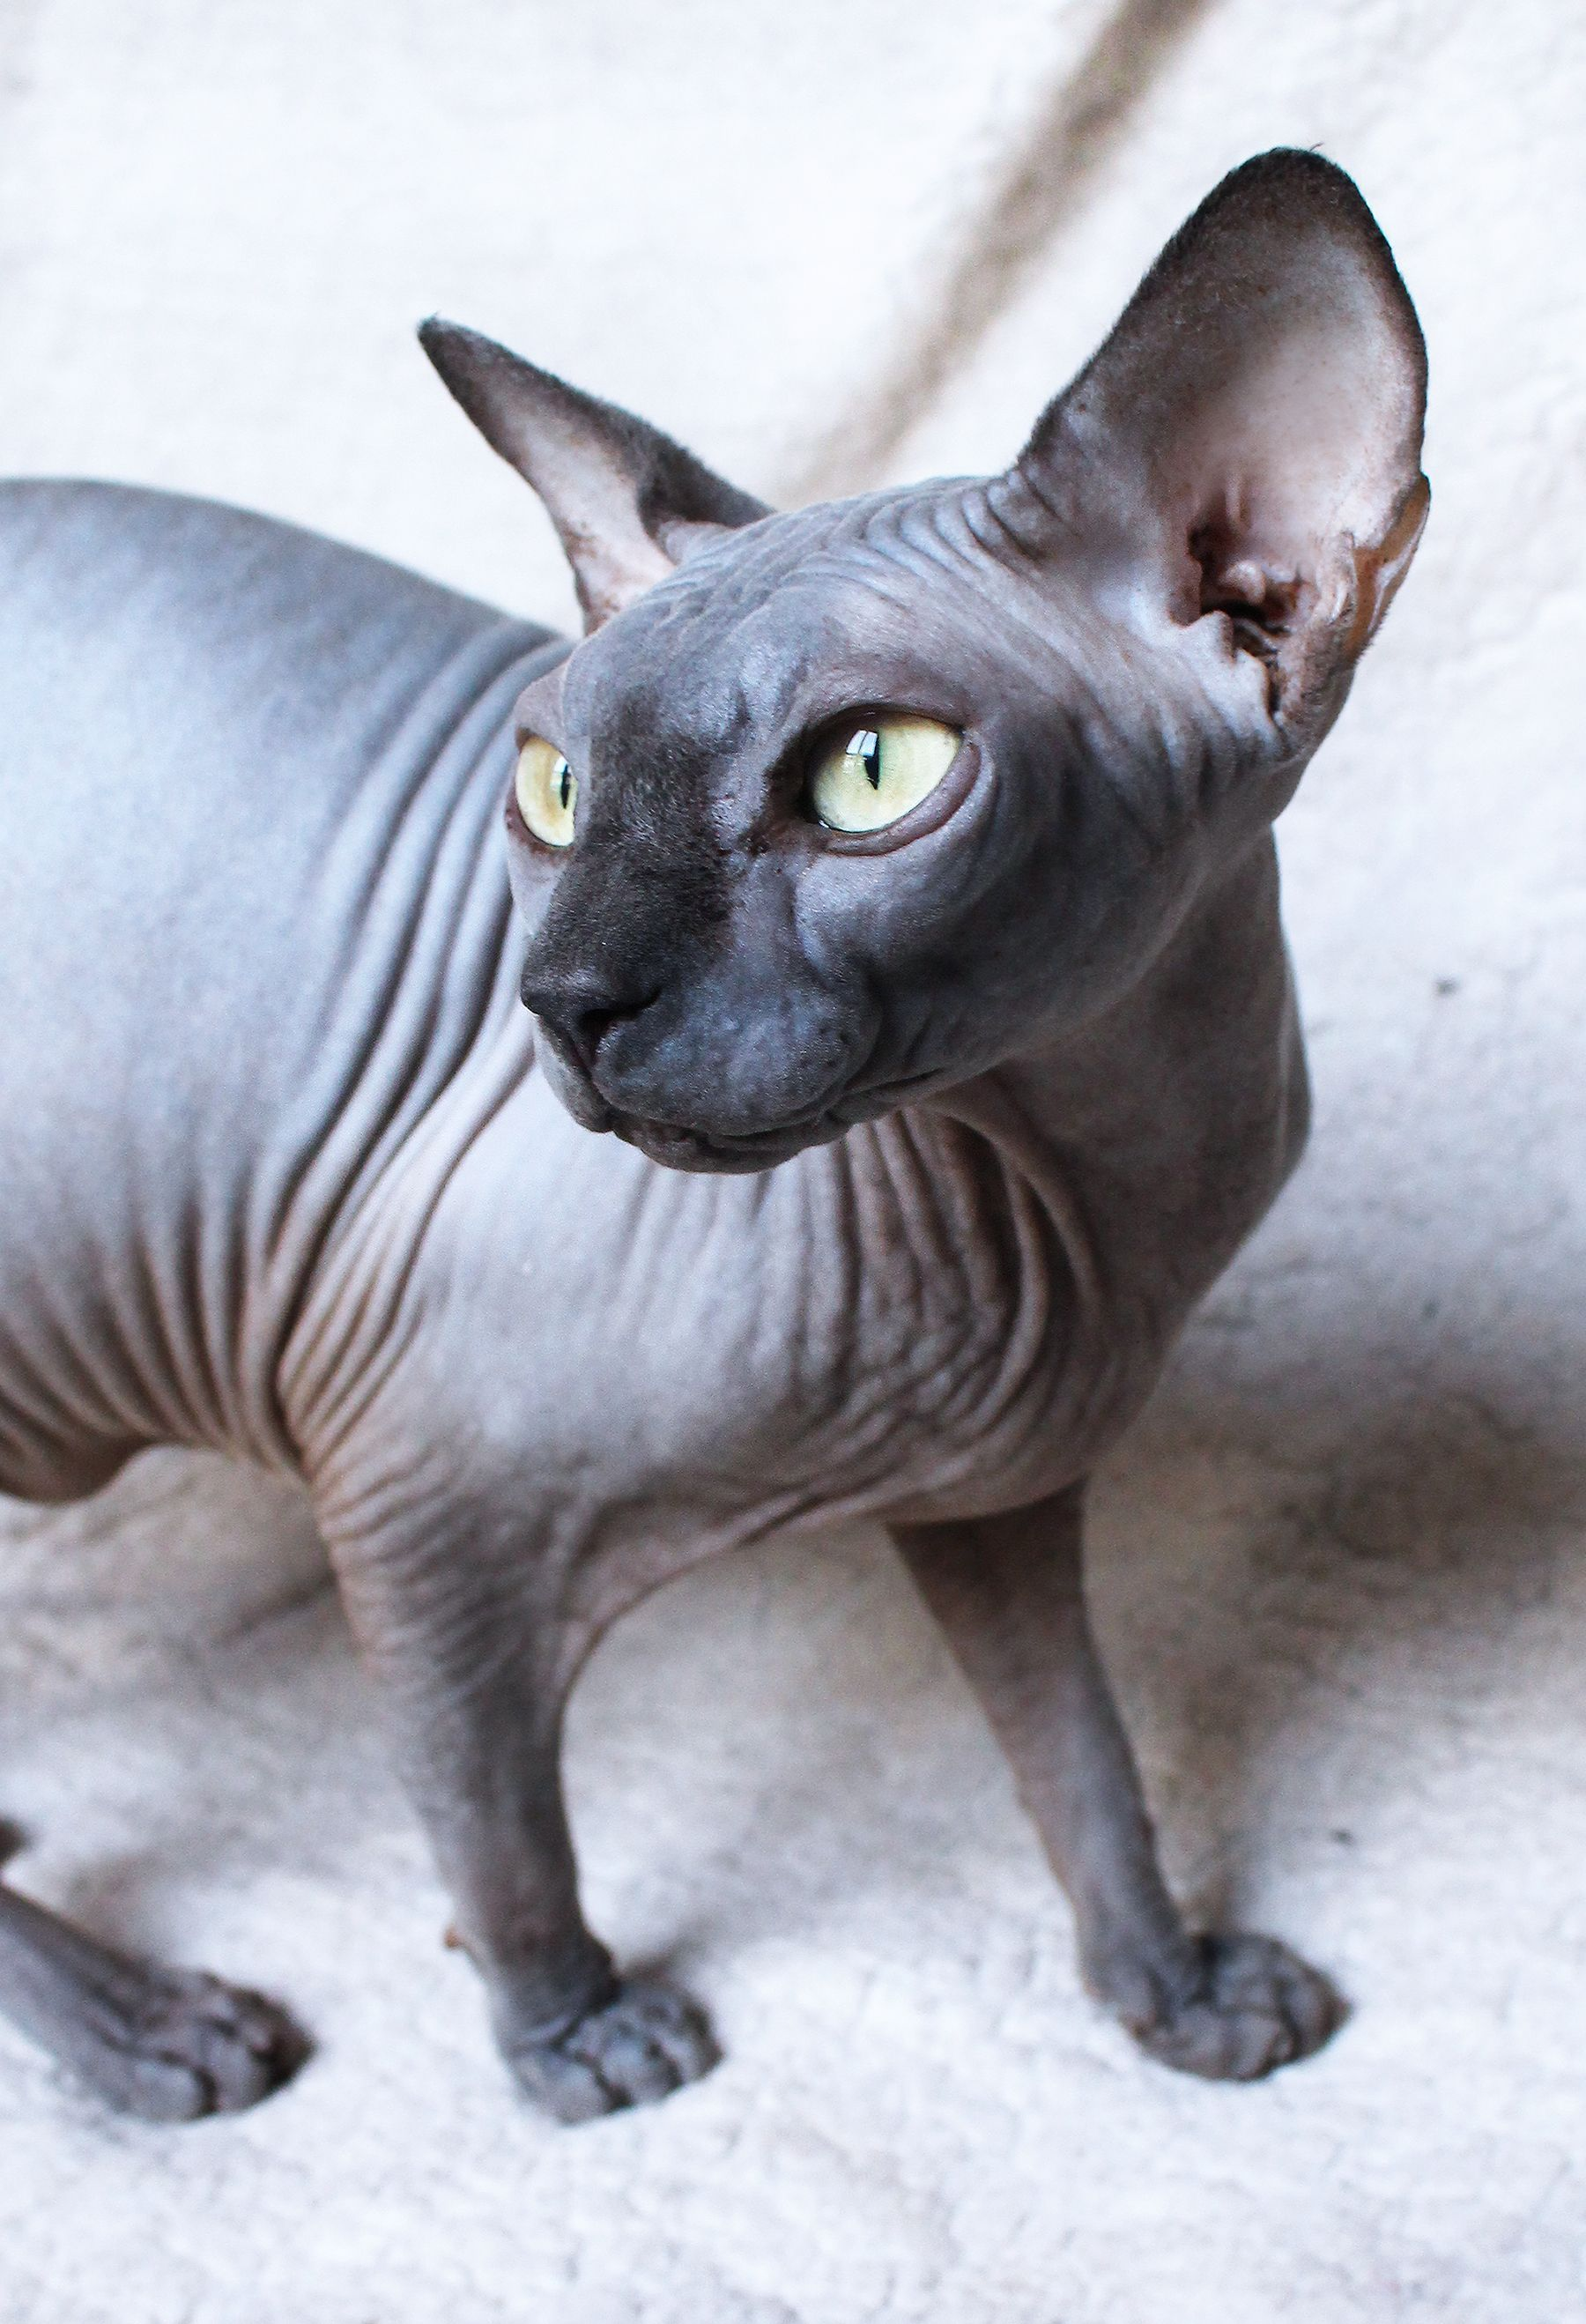 Loki the blue sphynx cat Cat care, Sphynx cat, Buy a kitten